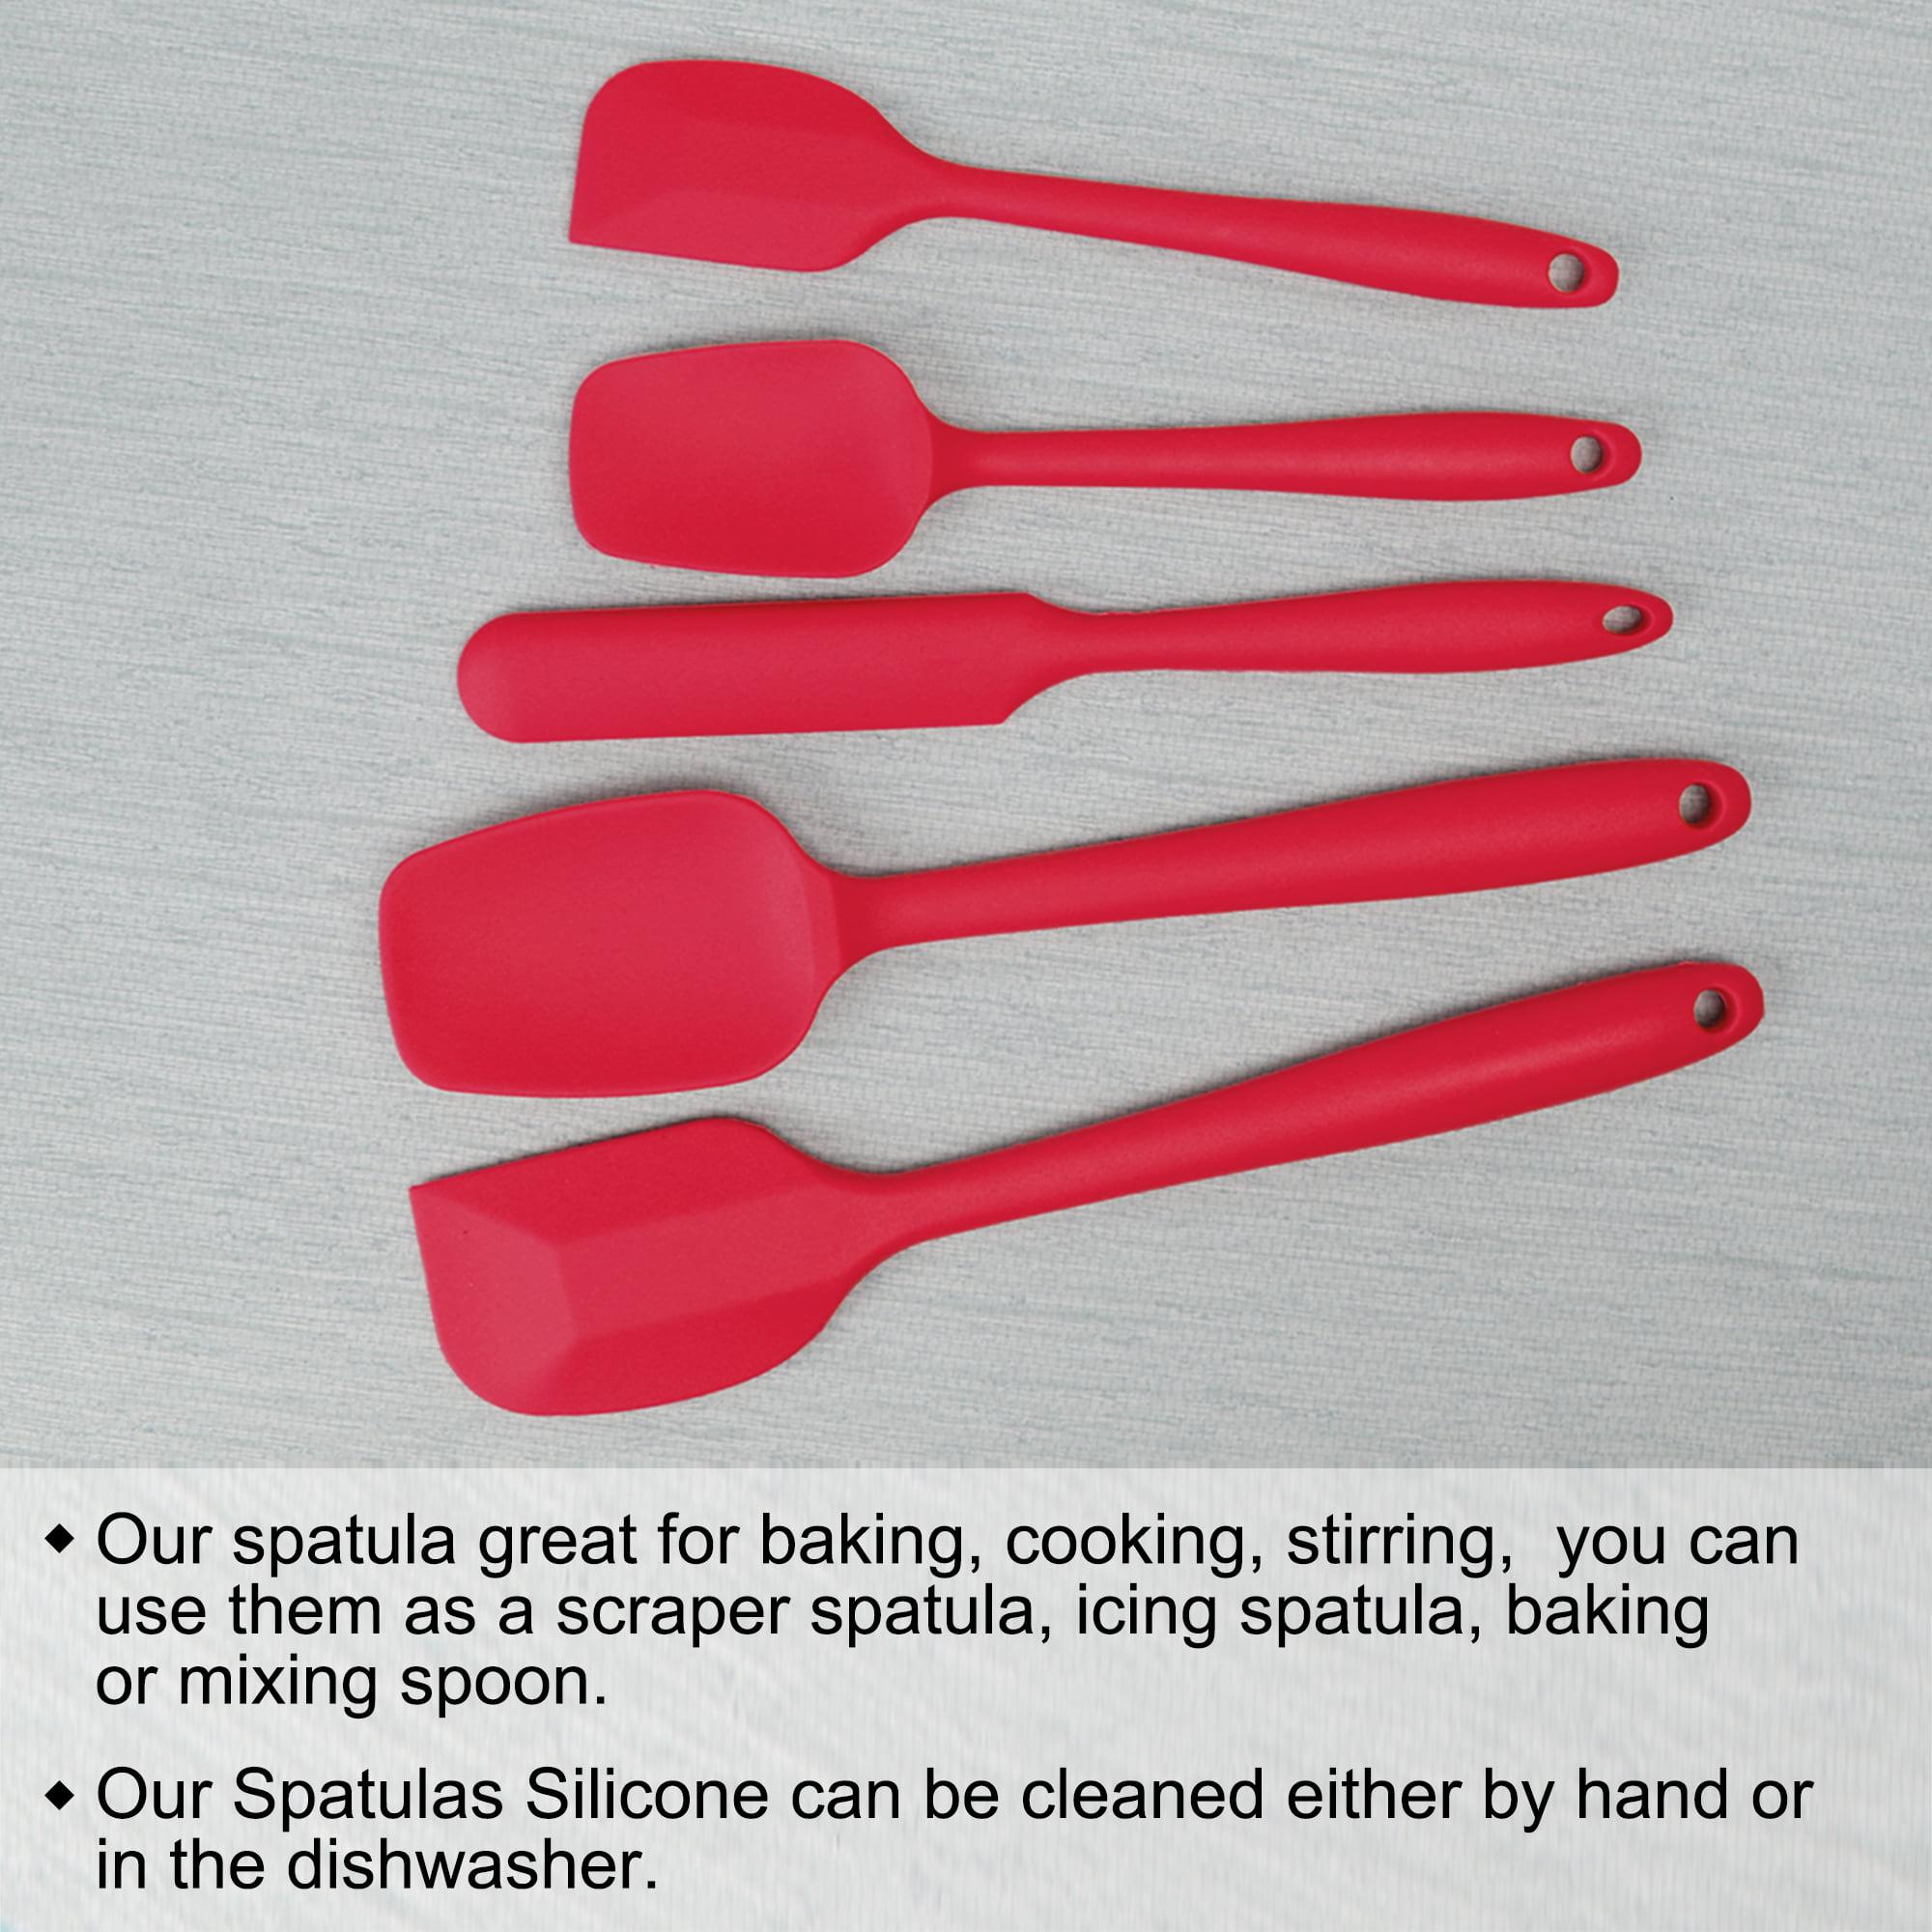 5Pcs Spatulas Set Non Stick Silicone Heat Resistant Baking Kitchen Tools Spatula